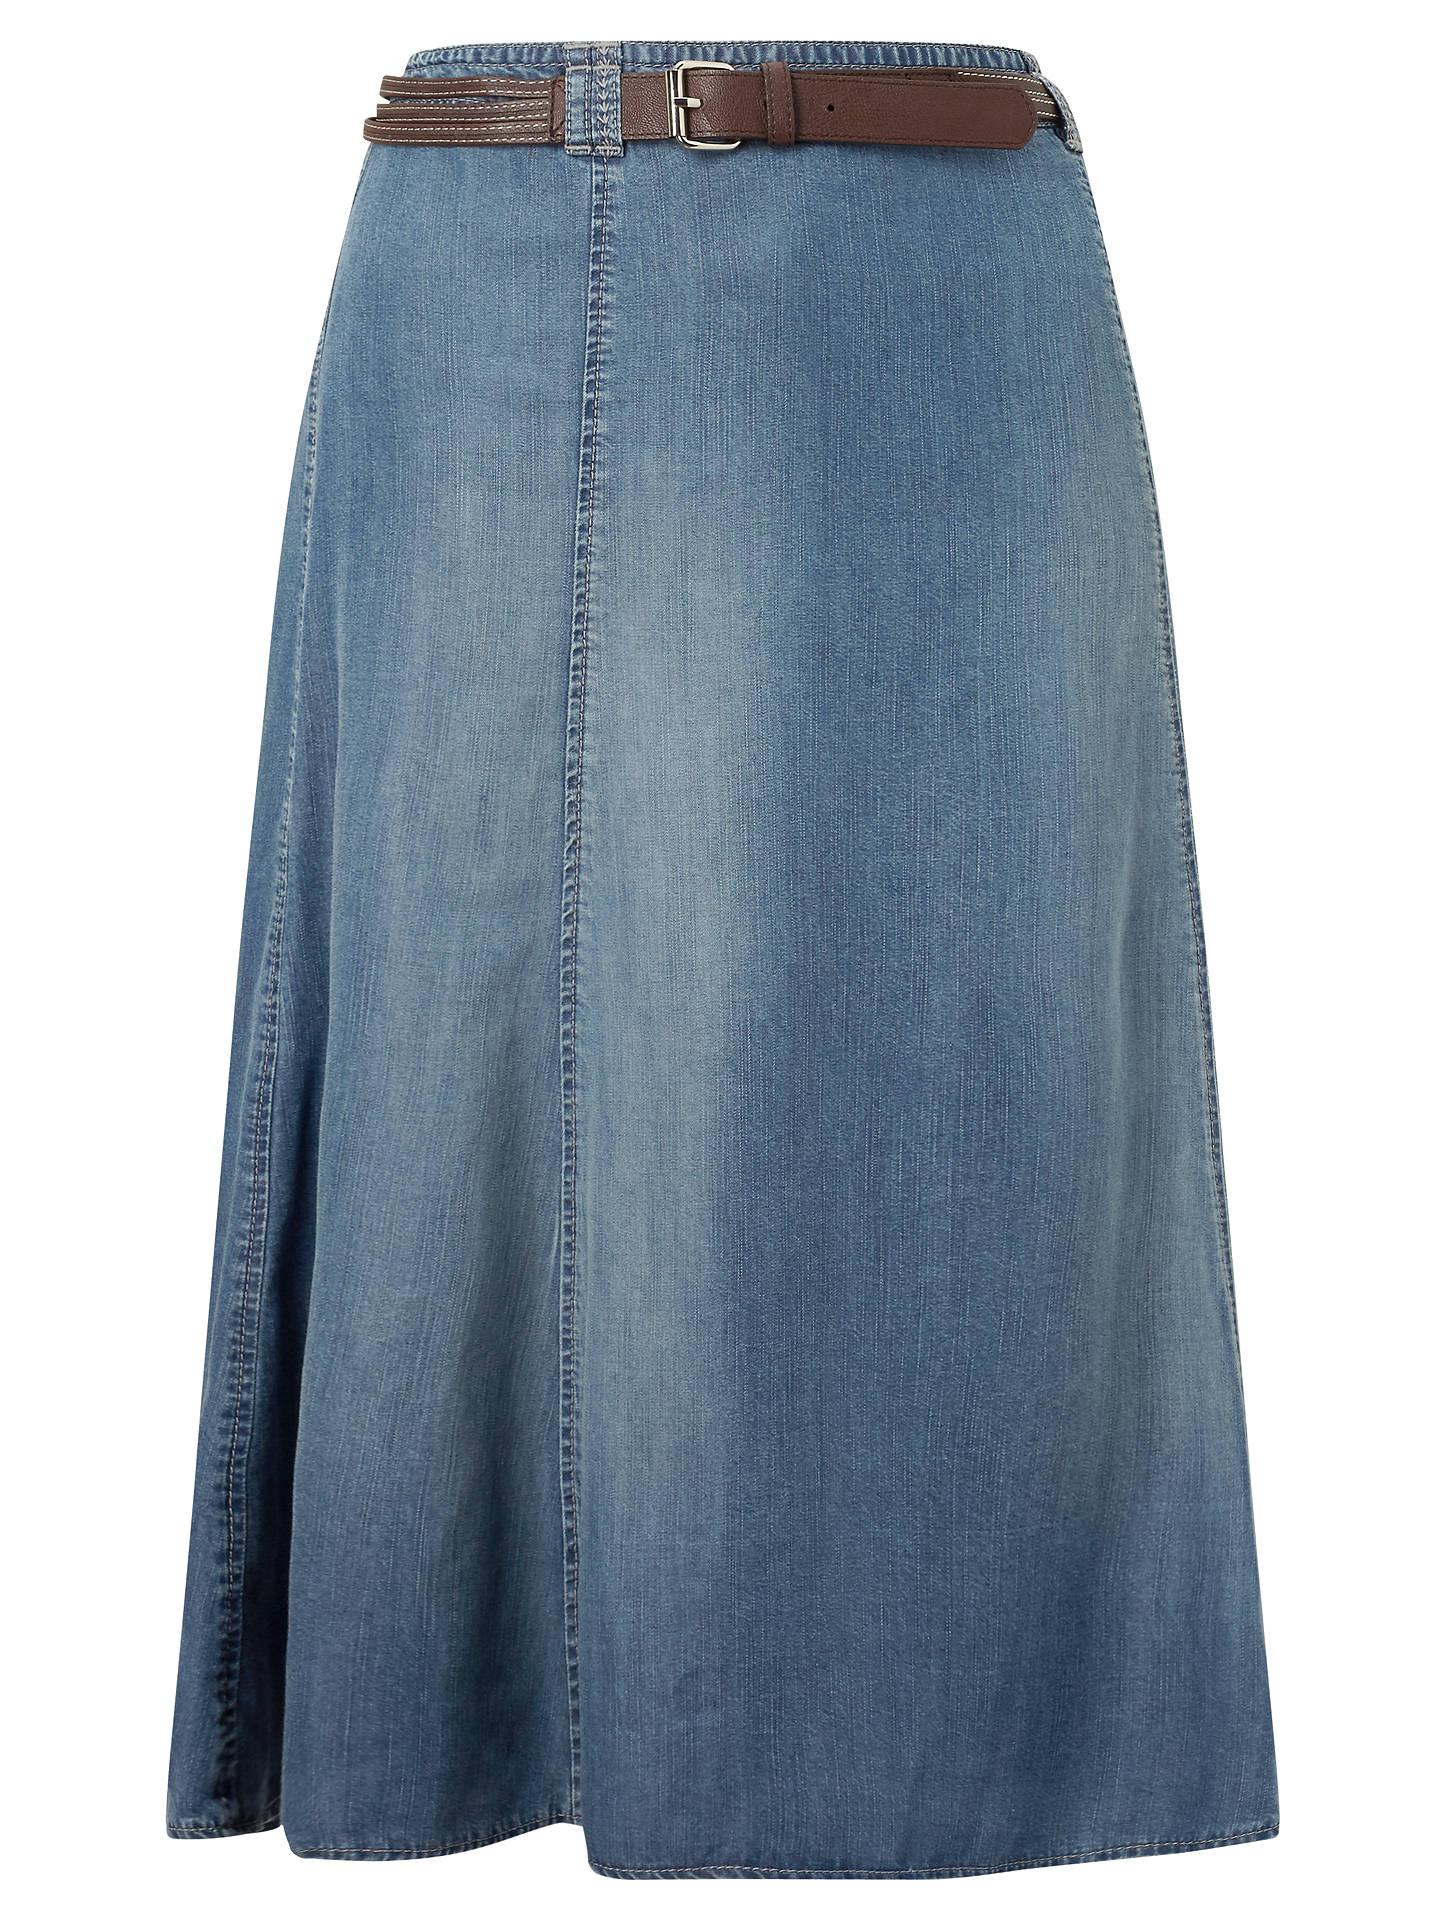 efdceac68f Buy Gerry Weber Denim Skirt, Blue, 10 Online at johnlewis.com ...